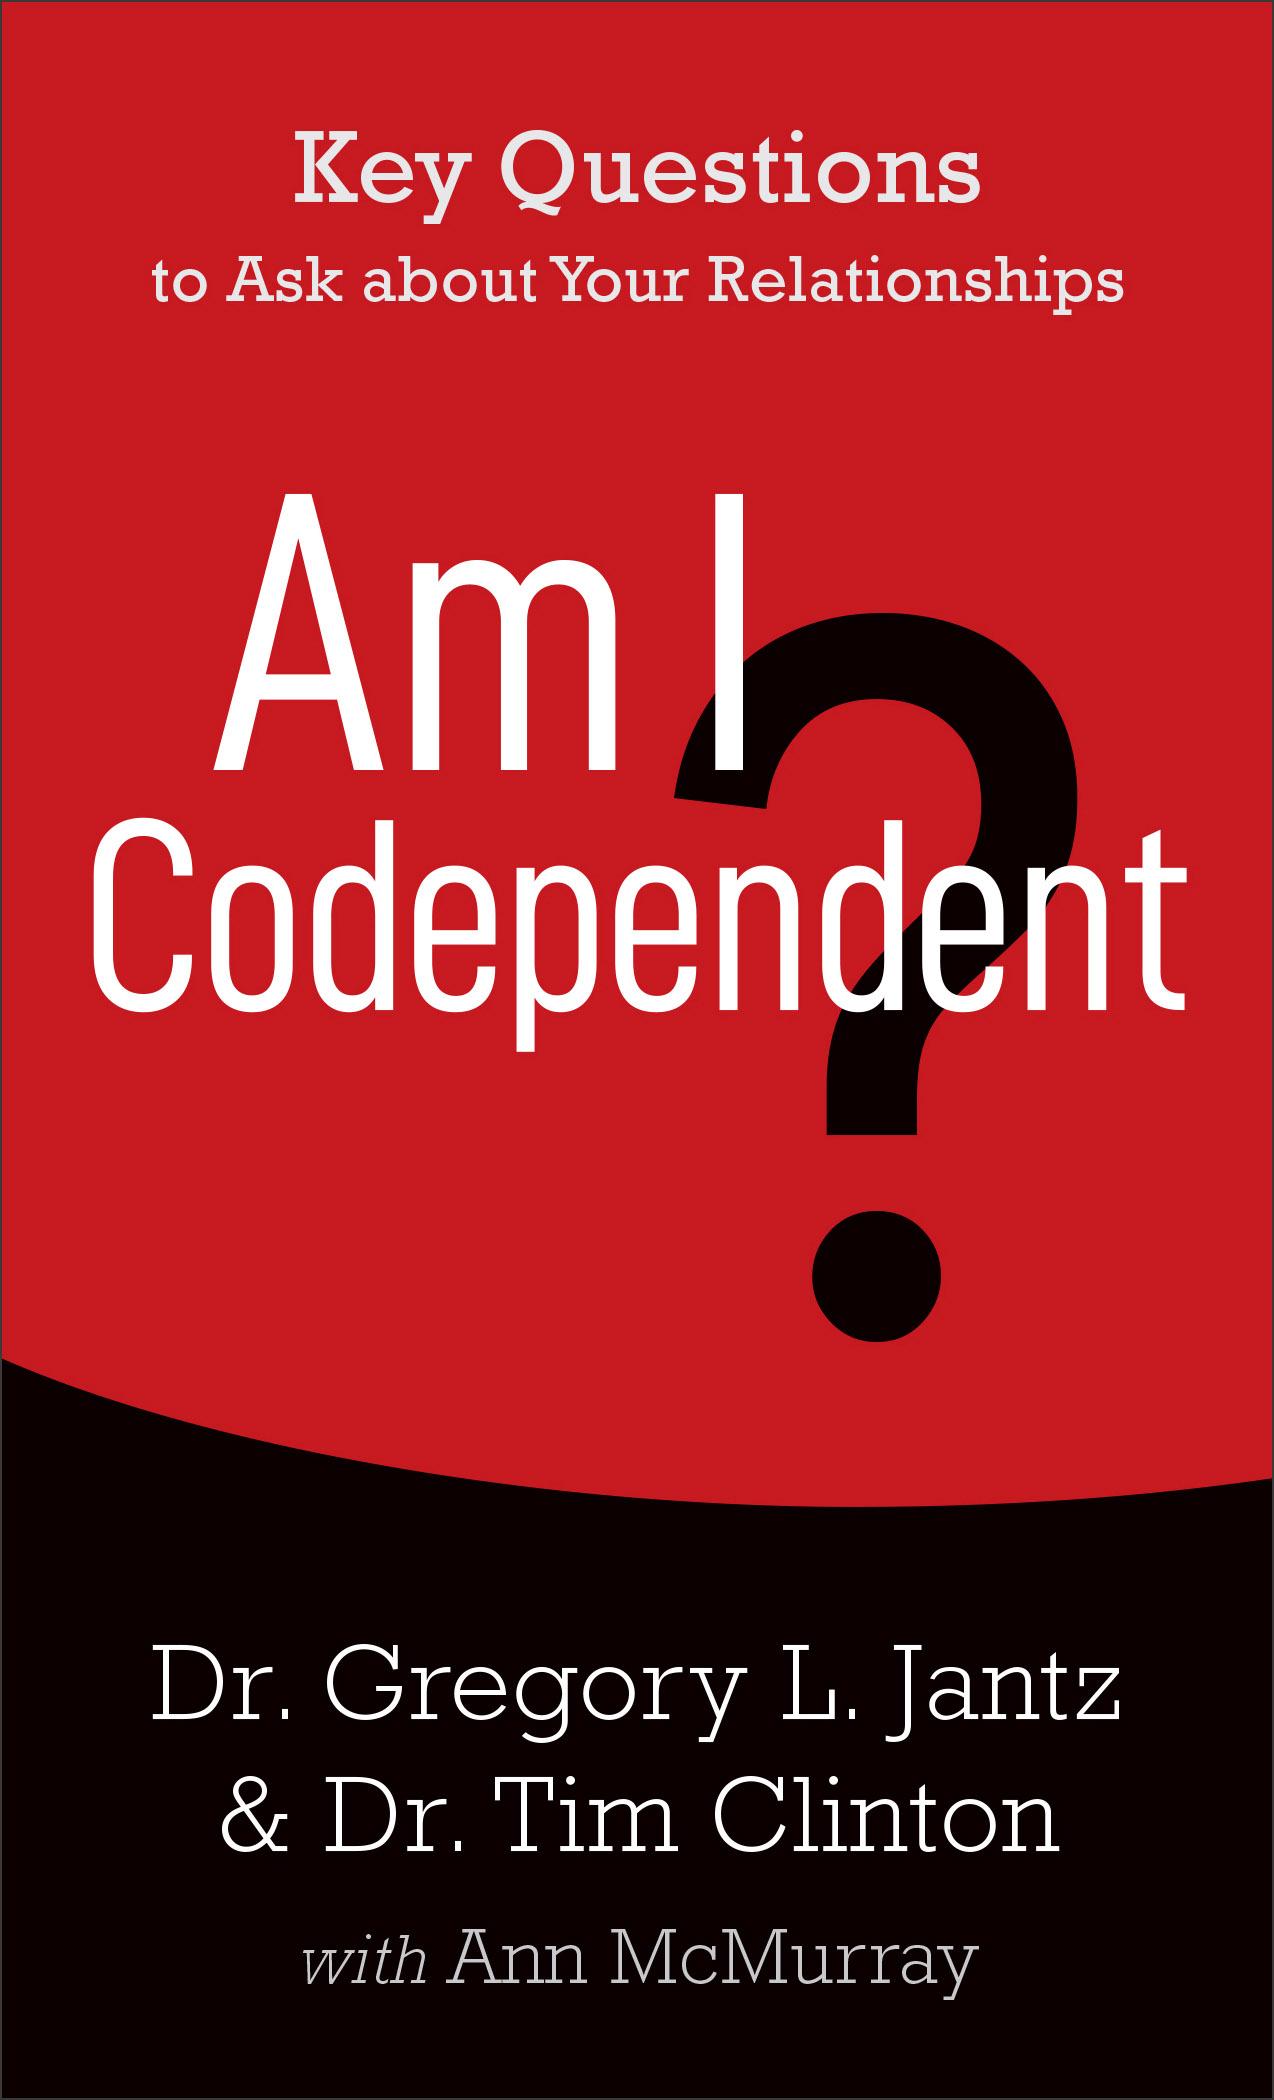 Am i codependent